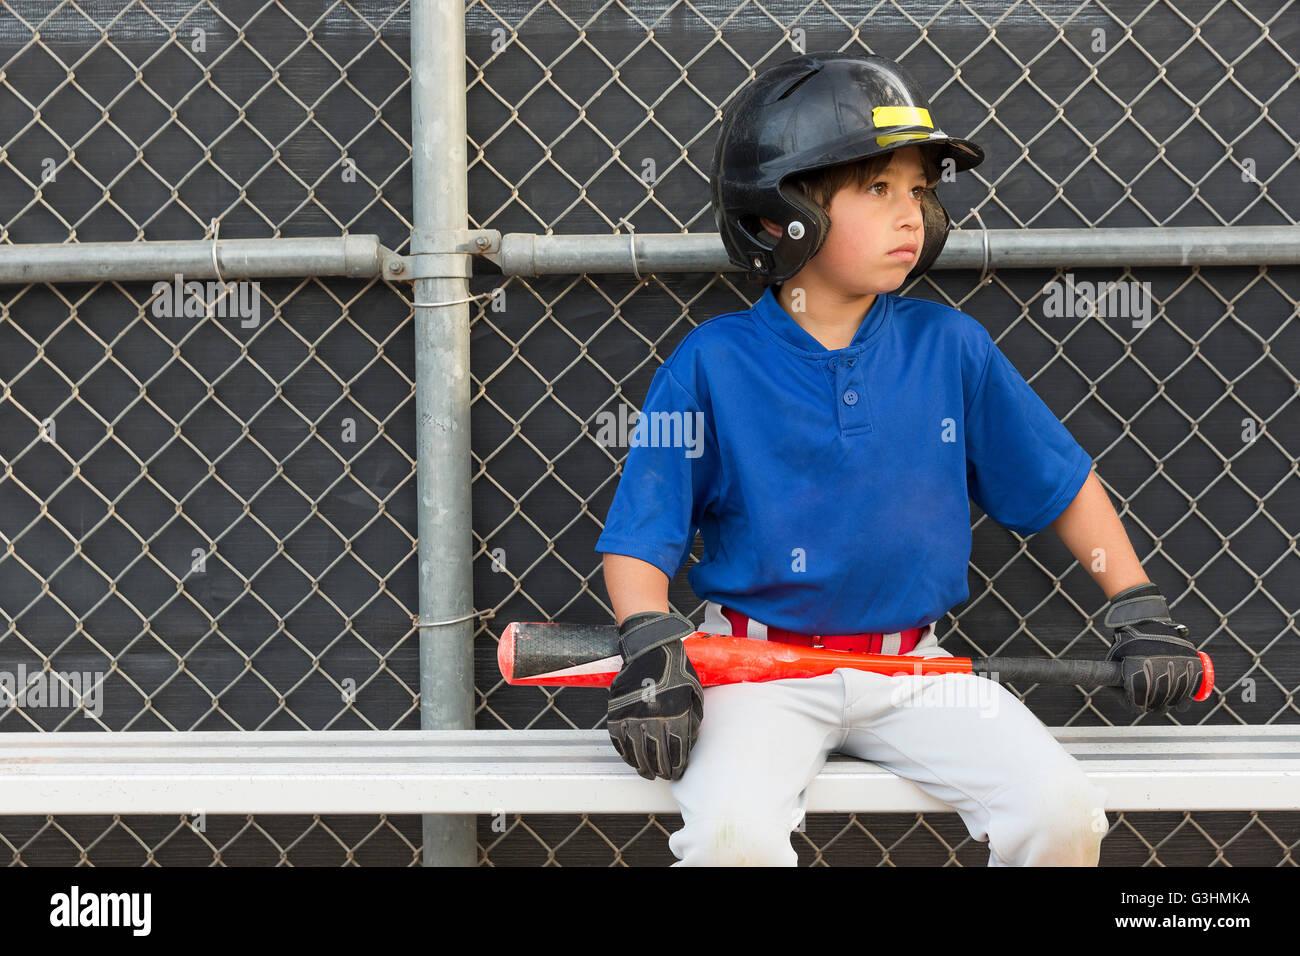 Boy with baseball bat watching from bench at baseball practise - Stock Image